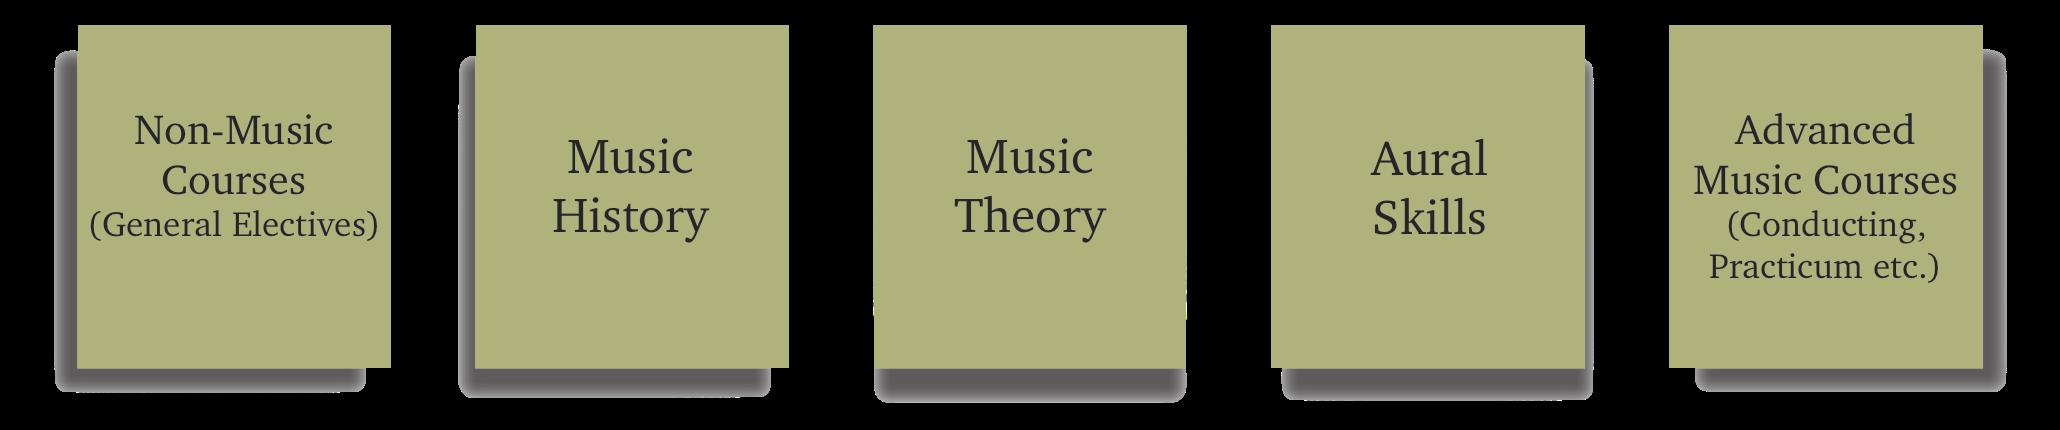 musiccourses